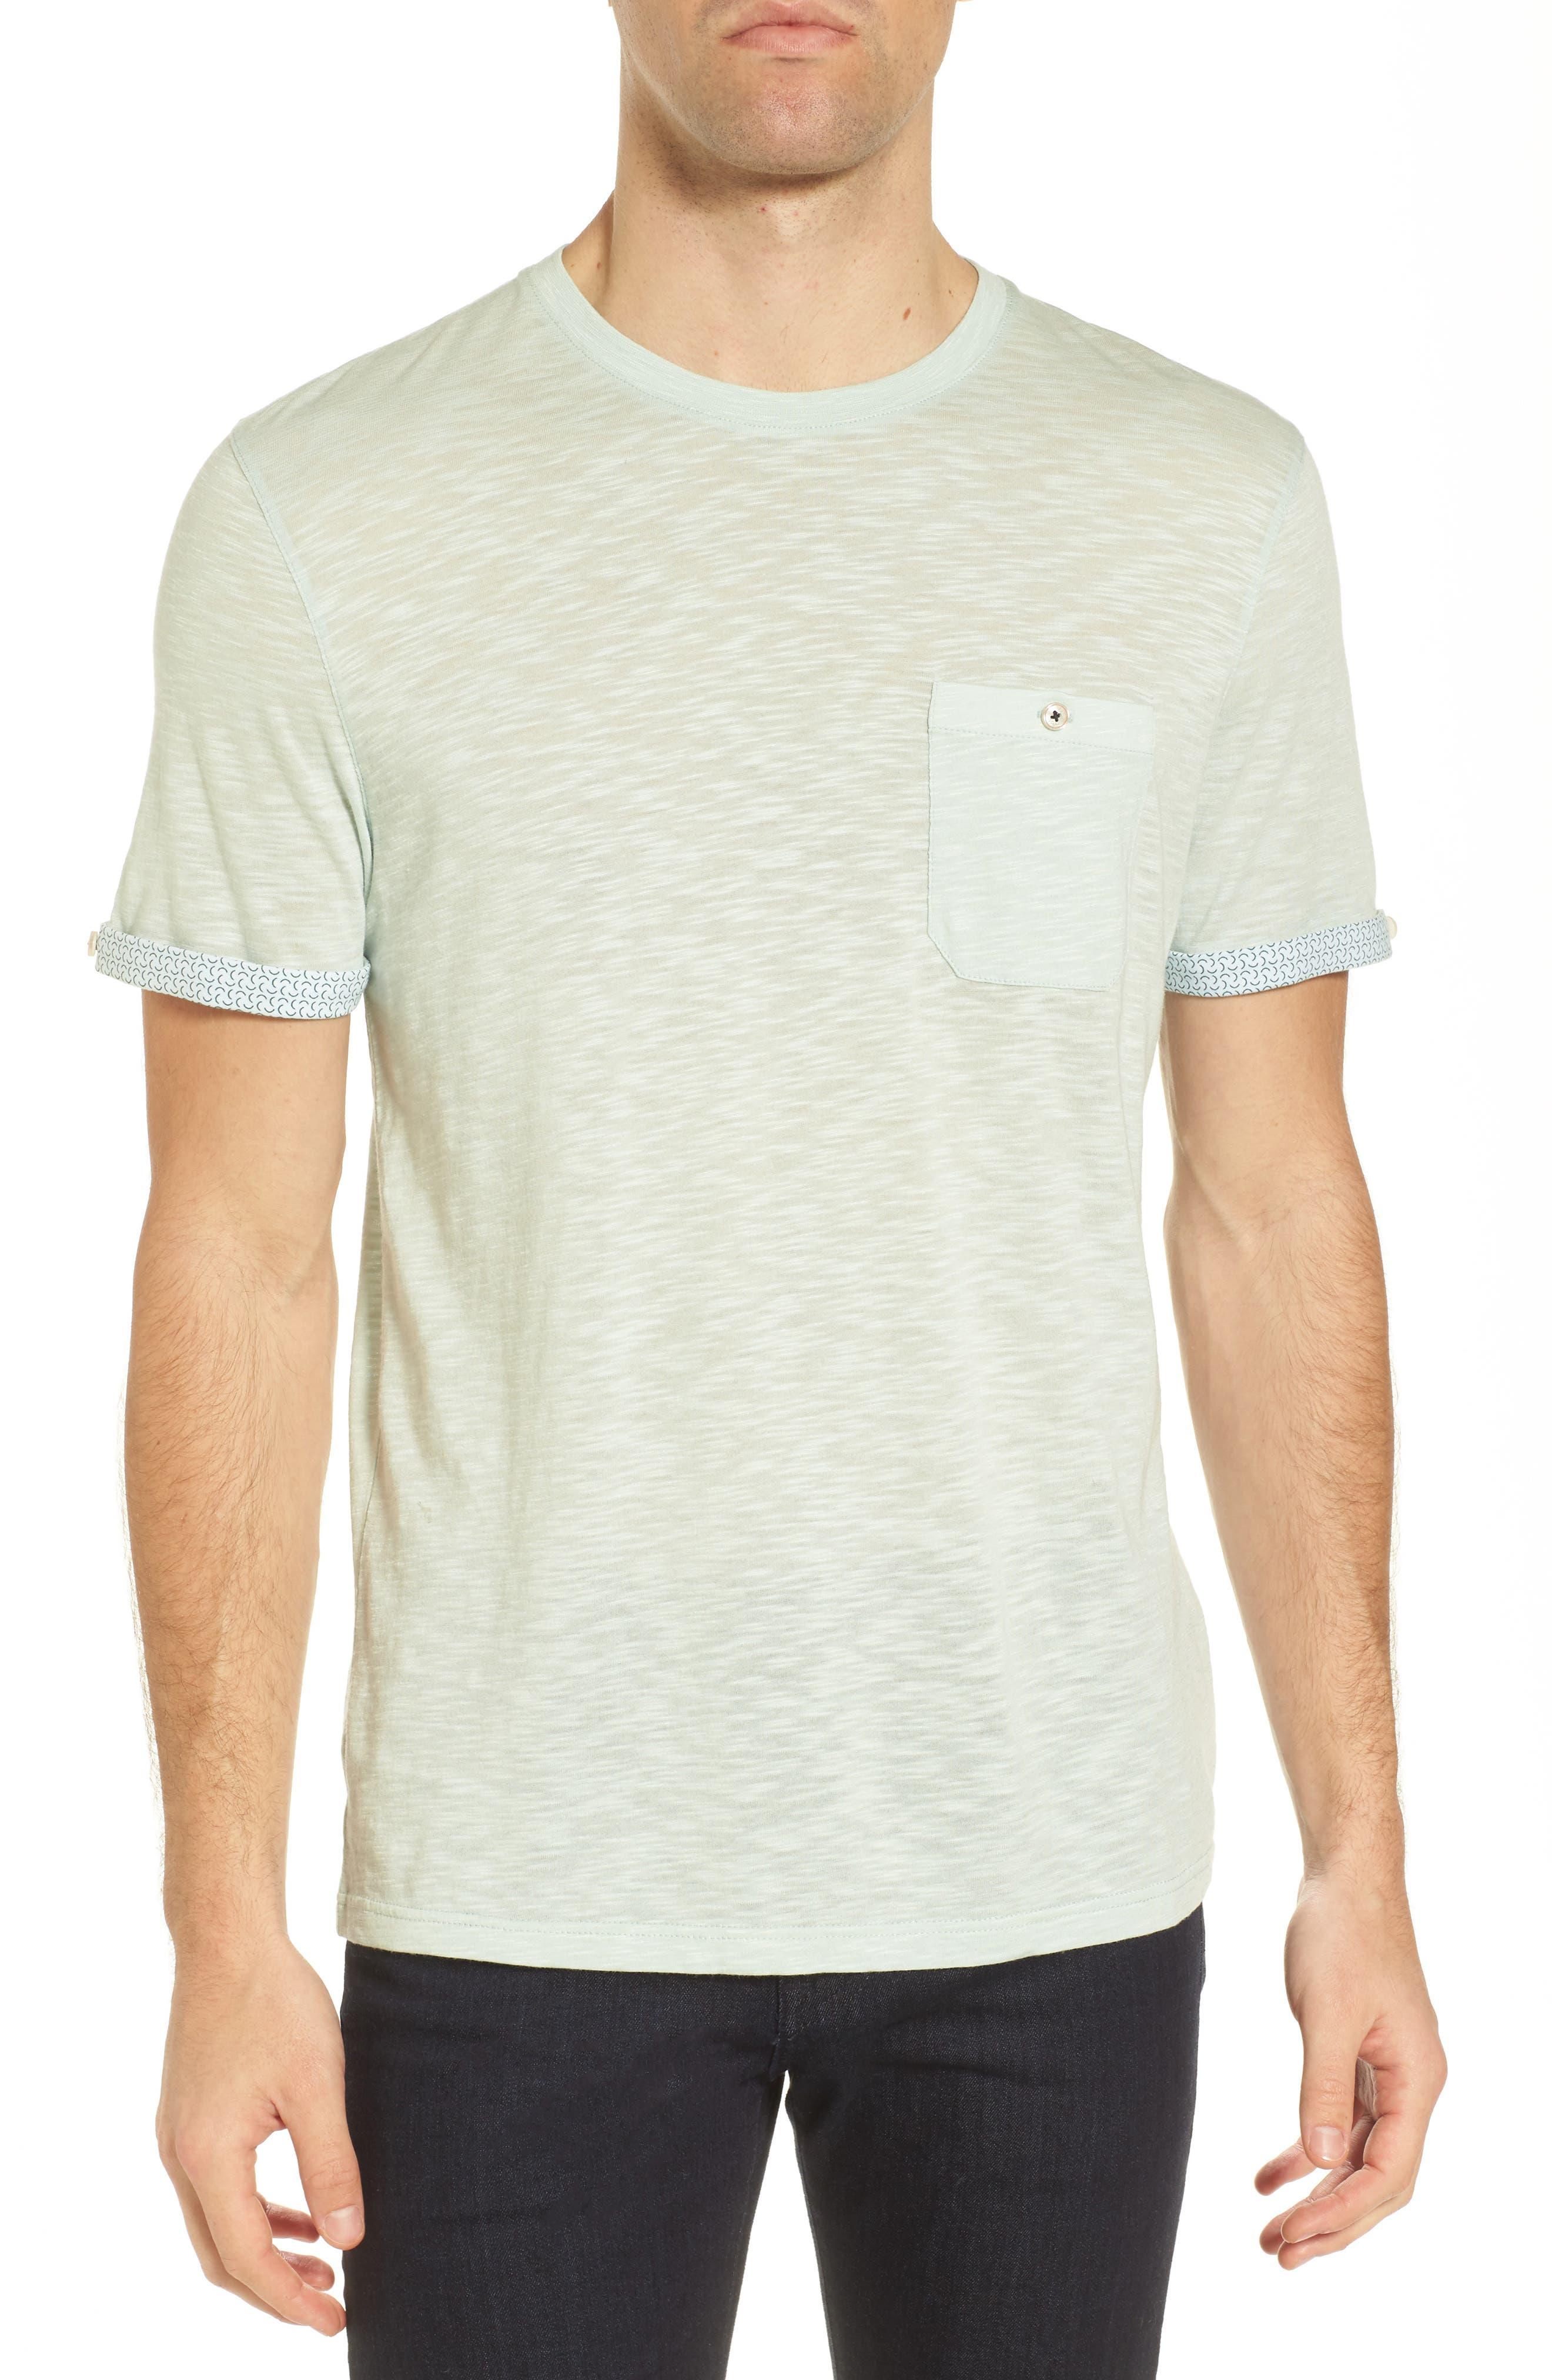 Alternate Image 1 Selected - Ted Baker London Taxi Slub Cotton Pocket T-Shirt